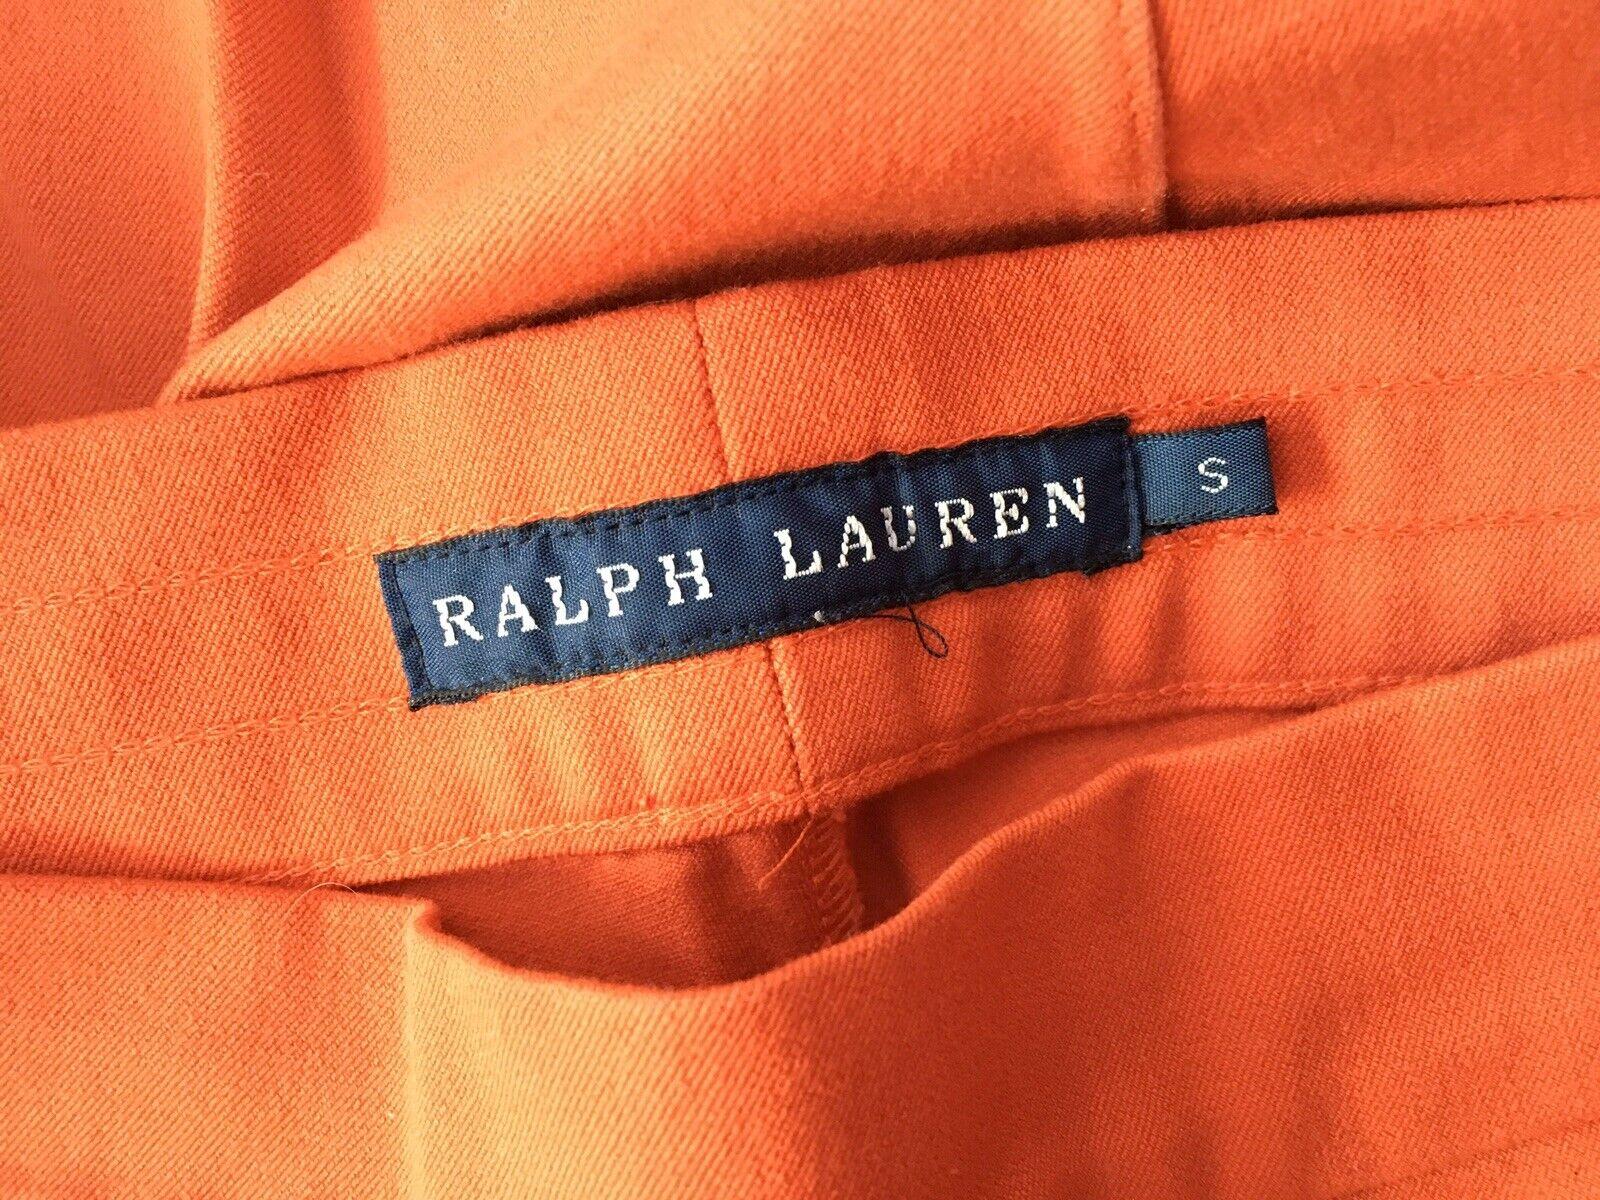 Ralph Lauren Lauren Lauren arancio brillante Slim Stretch Pants pantaloni Taglia S Small c9a08e